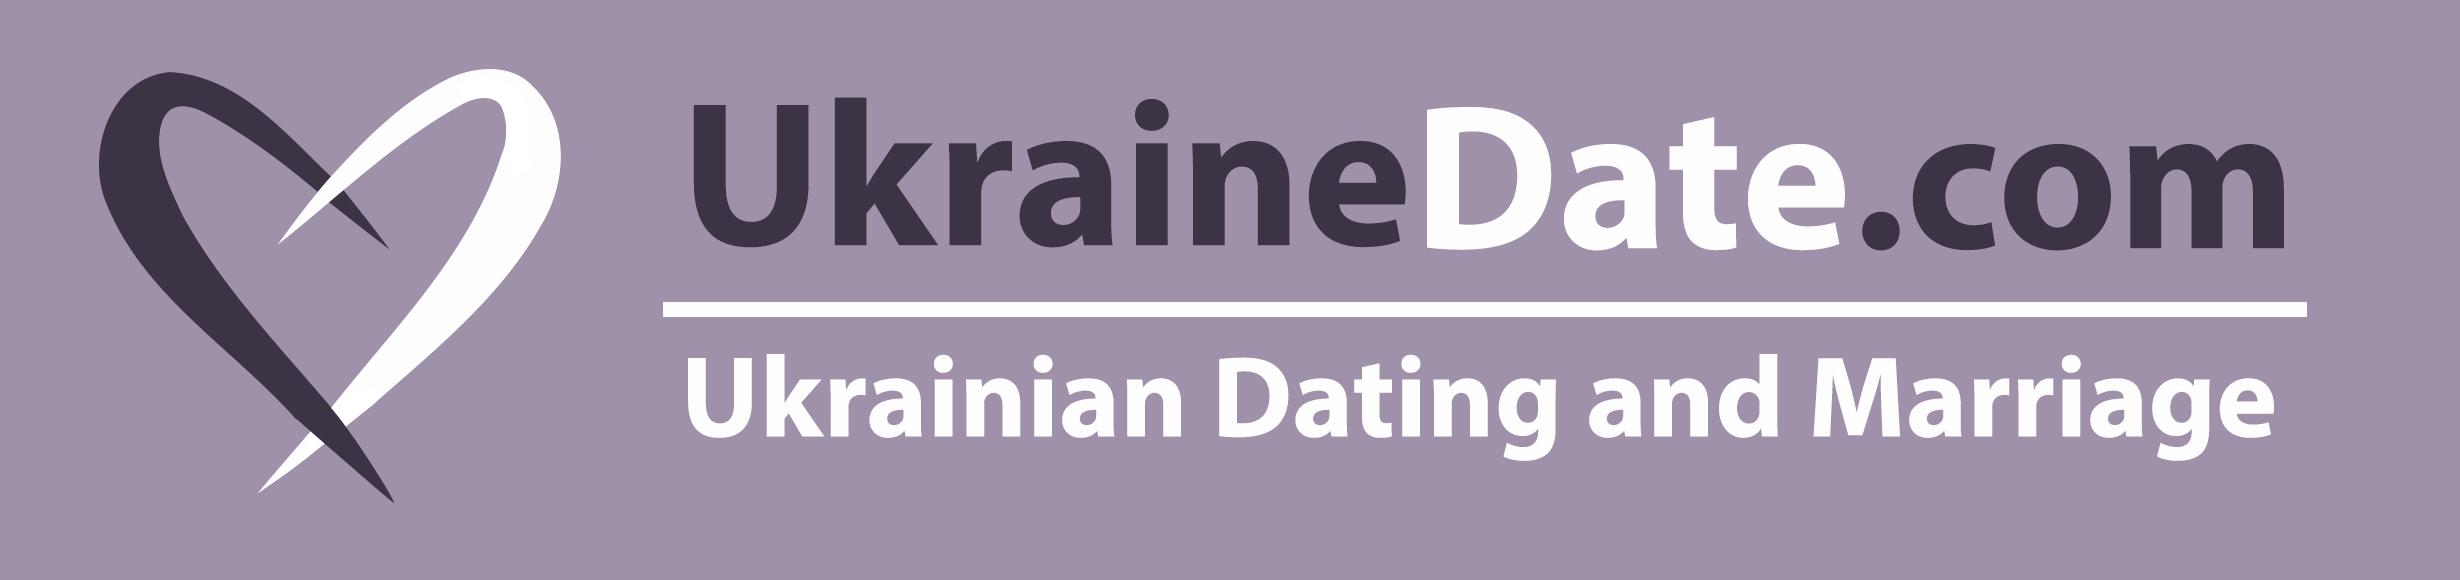 Ukraine Date Logo